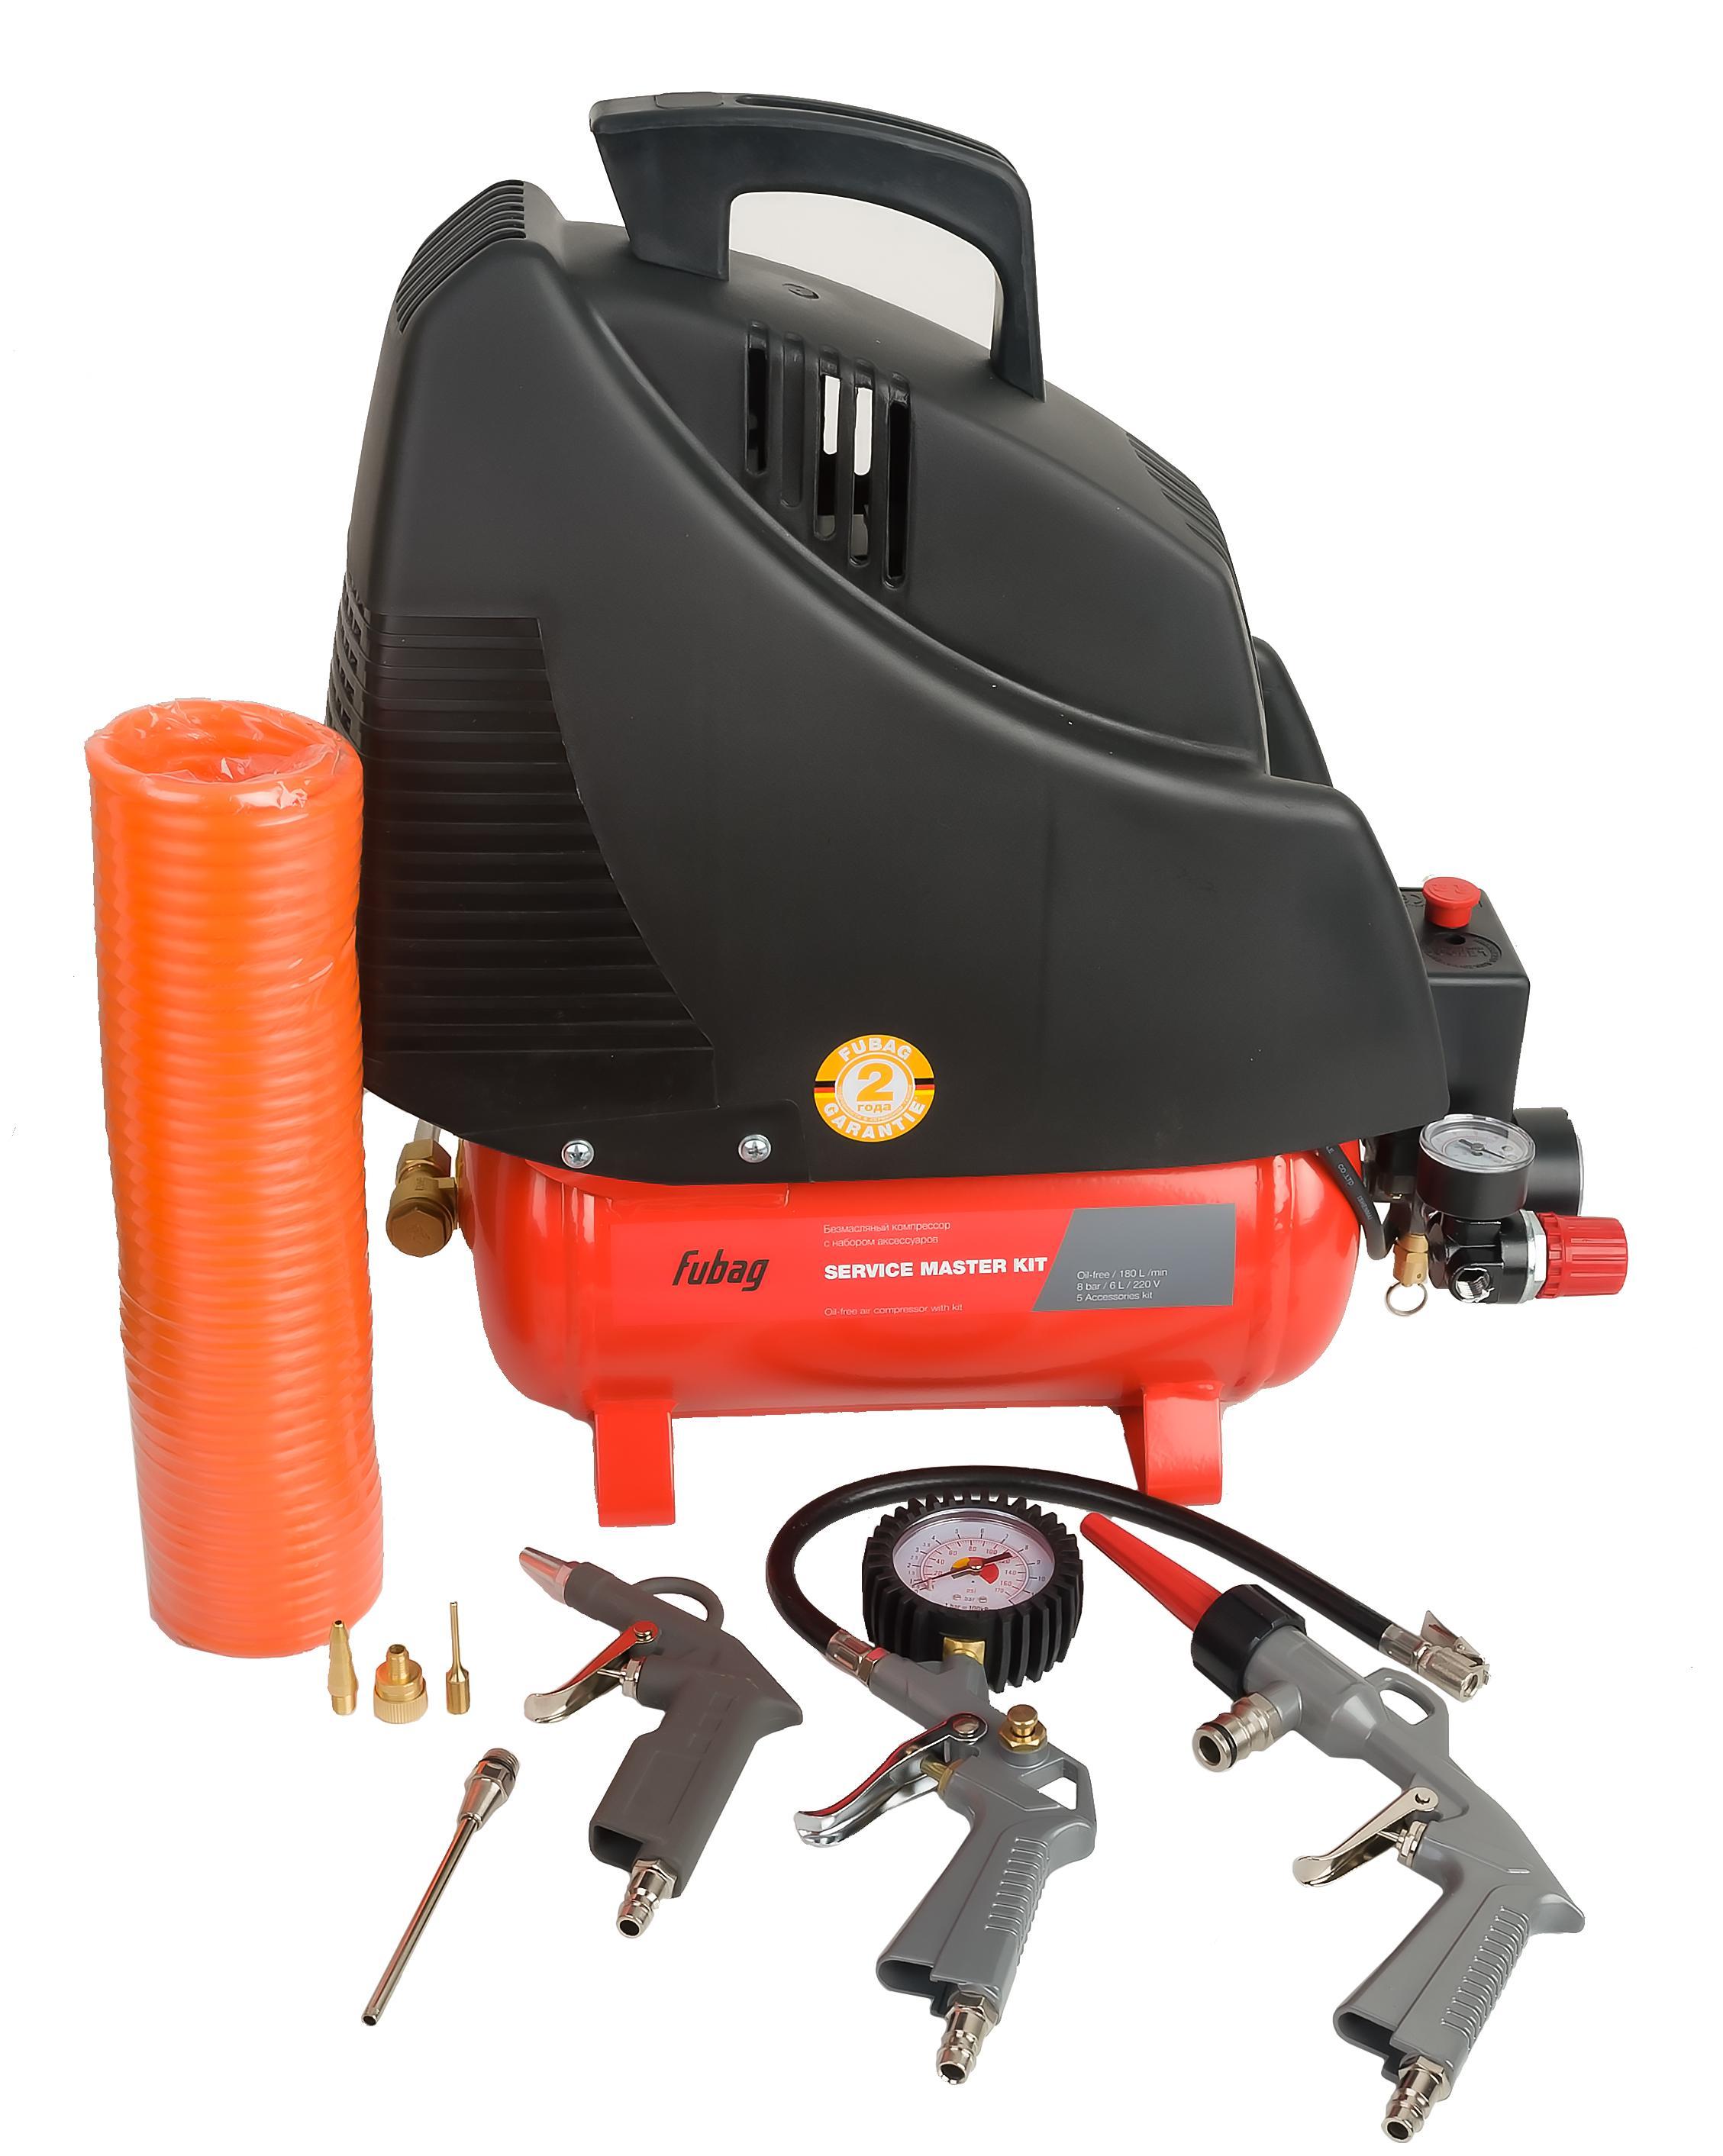 Компрессор Fubag Service master kit компрессор fubag auto master kit 10